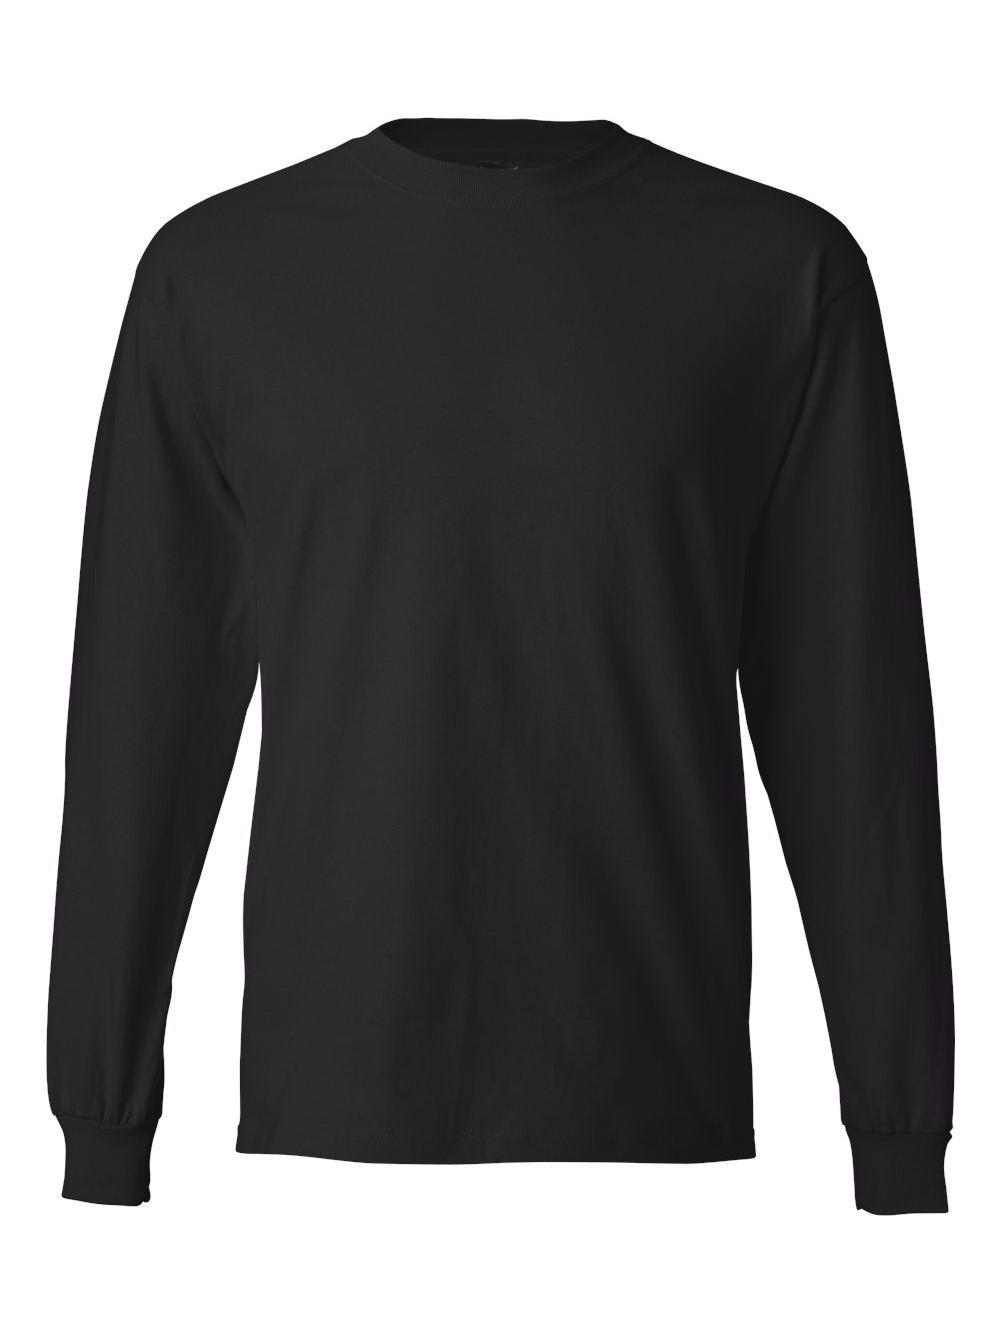 Hanes-Beefy-T-Long-Sleeve-T-Shirt-5186 thumbnail 6